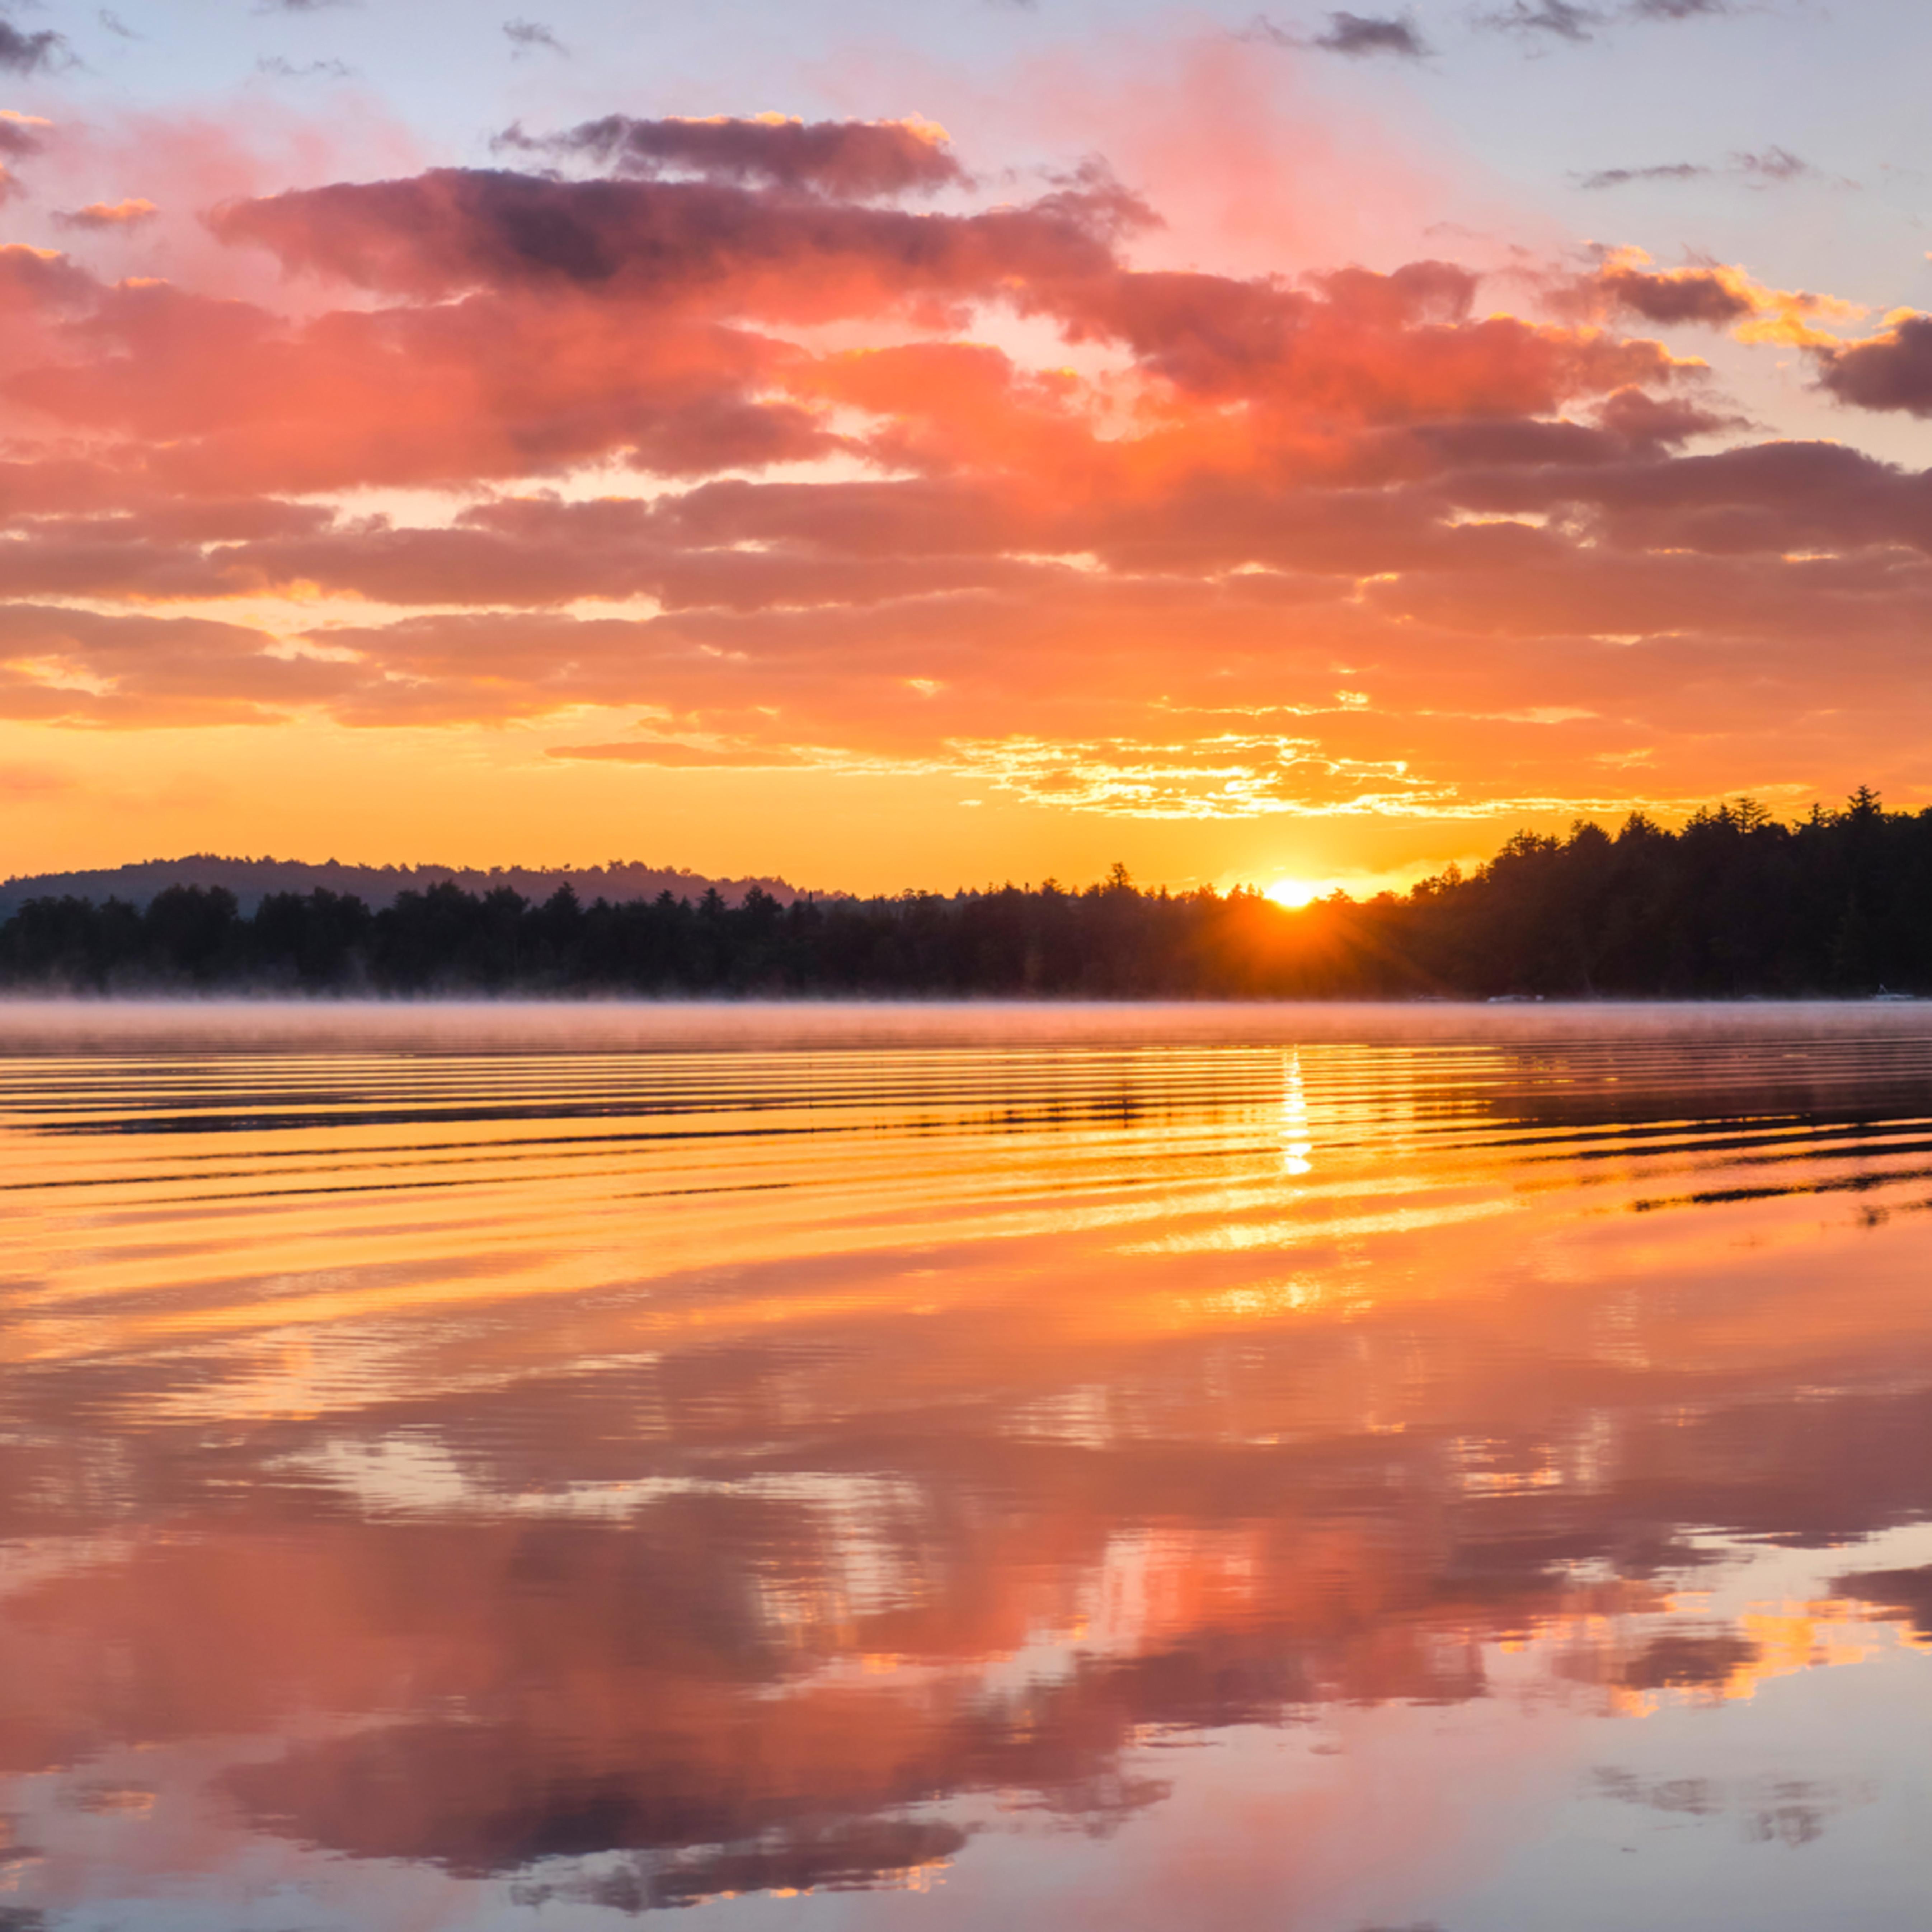 2nd lake sunrise 12x36 gkjhsf